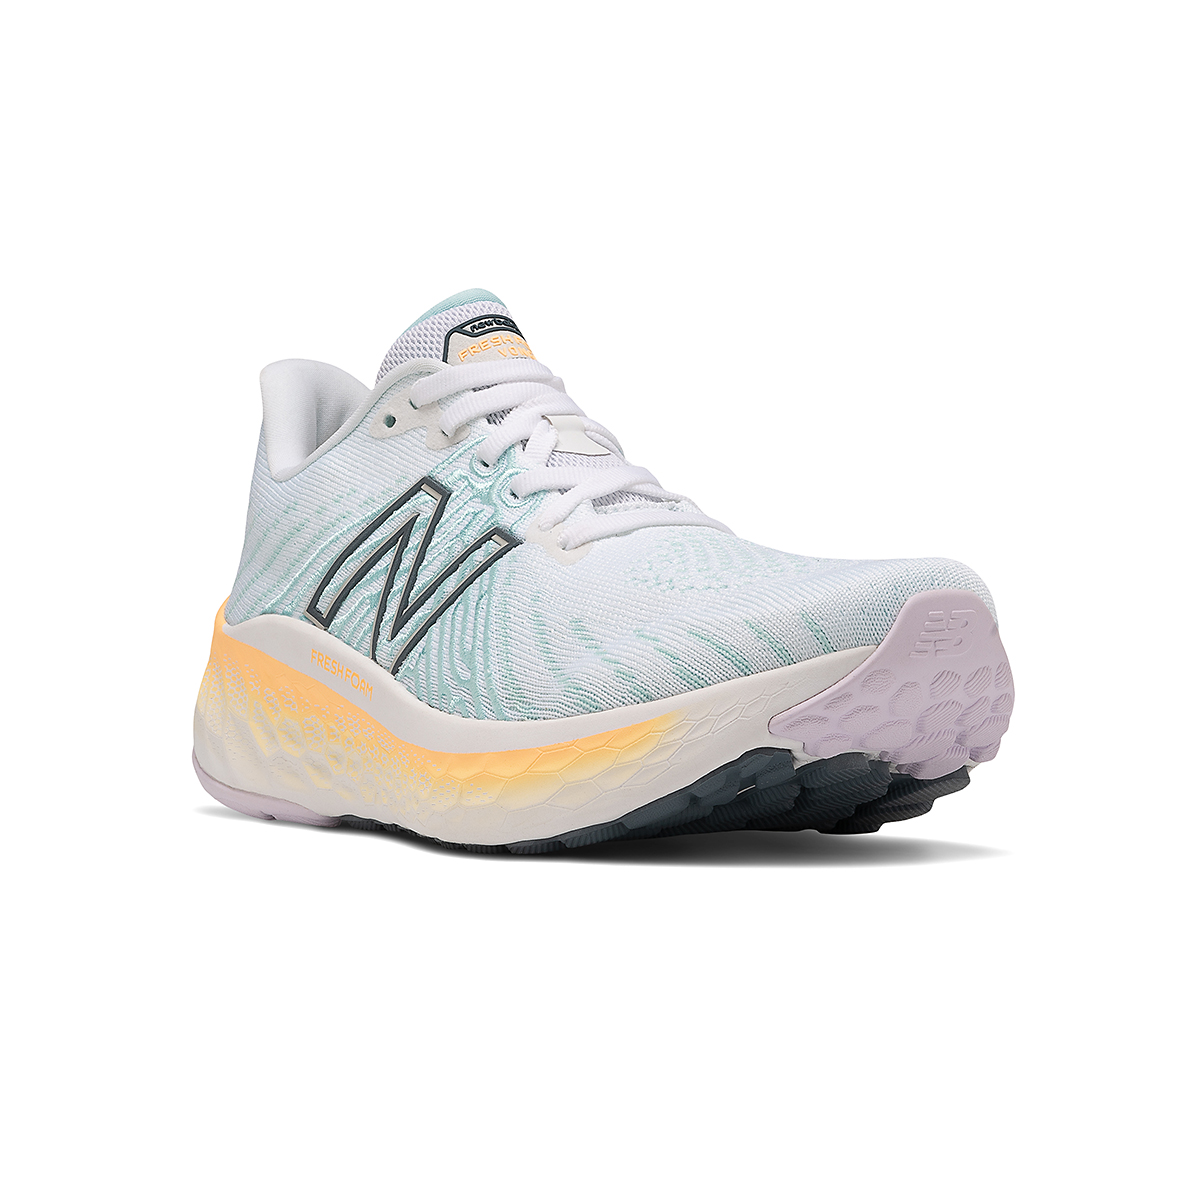 Women's New Balance Fresh Foam Vongo V5 Running Shoe - Color: White/Light Mango - Size: 5 - Width: Regular, White/Light Mango, large, image 3